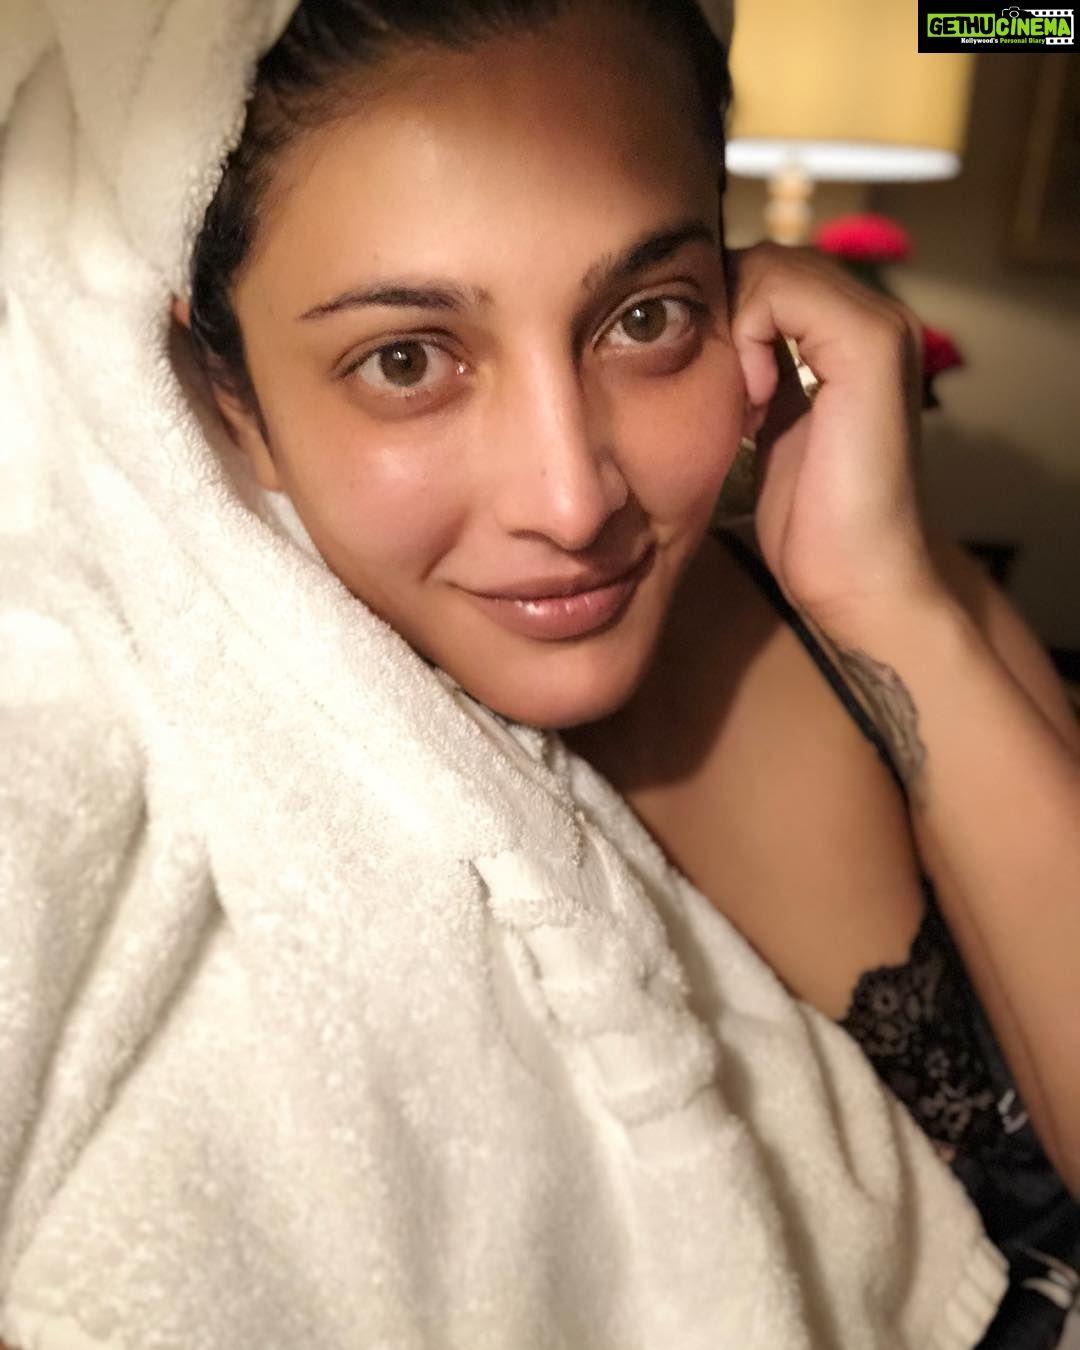 Shruti Haasan after bath towel glamour Actress Shruti Haasan 2018 Latest  Social Media HD Gallery 980444107d